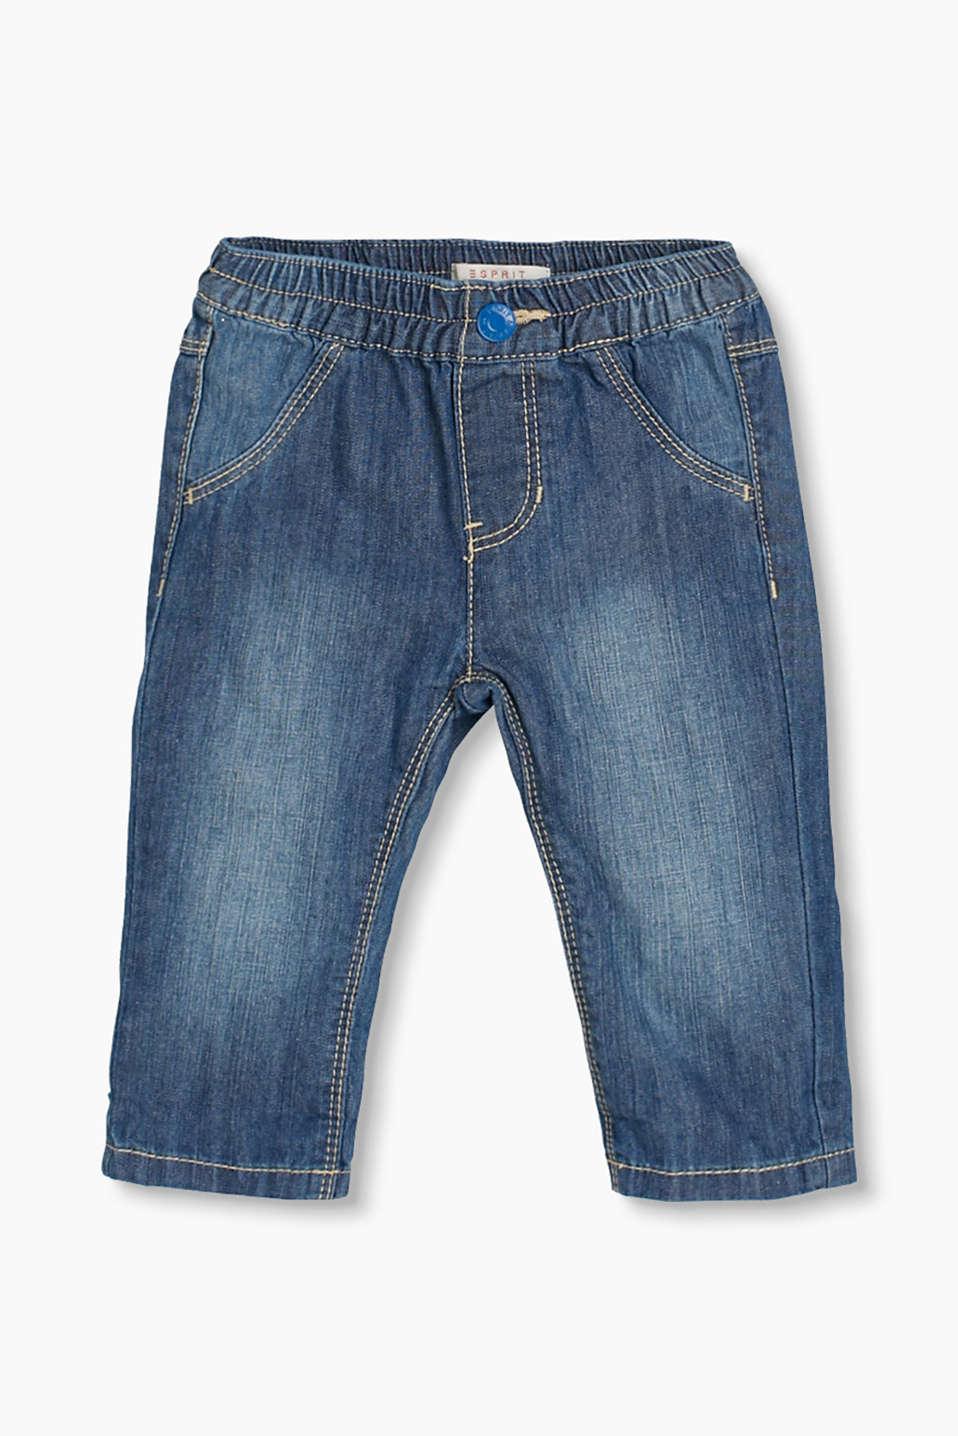 esprit basic jeans aus 100 baumwolle im online shop kaufen. Black Bedroom Furniture Sets. Home Design Ideas